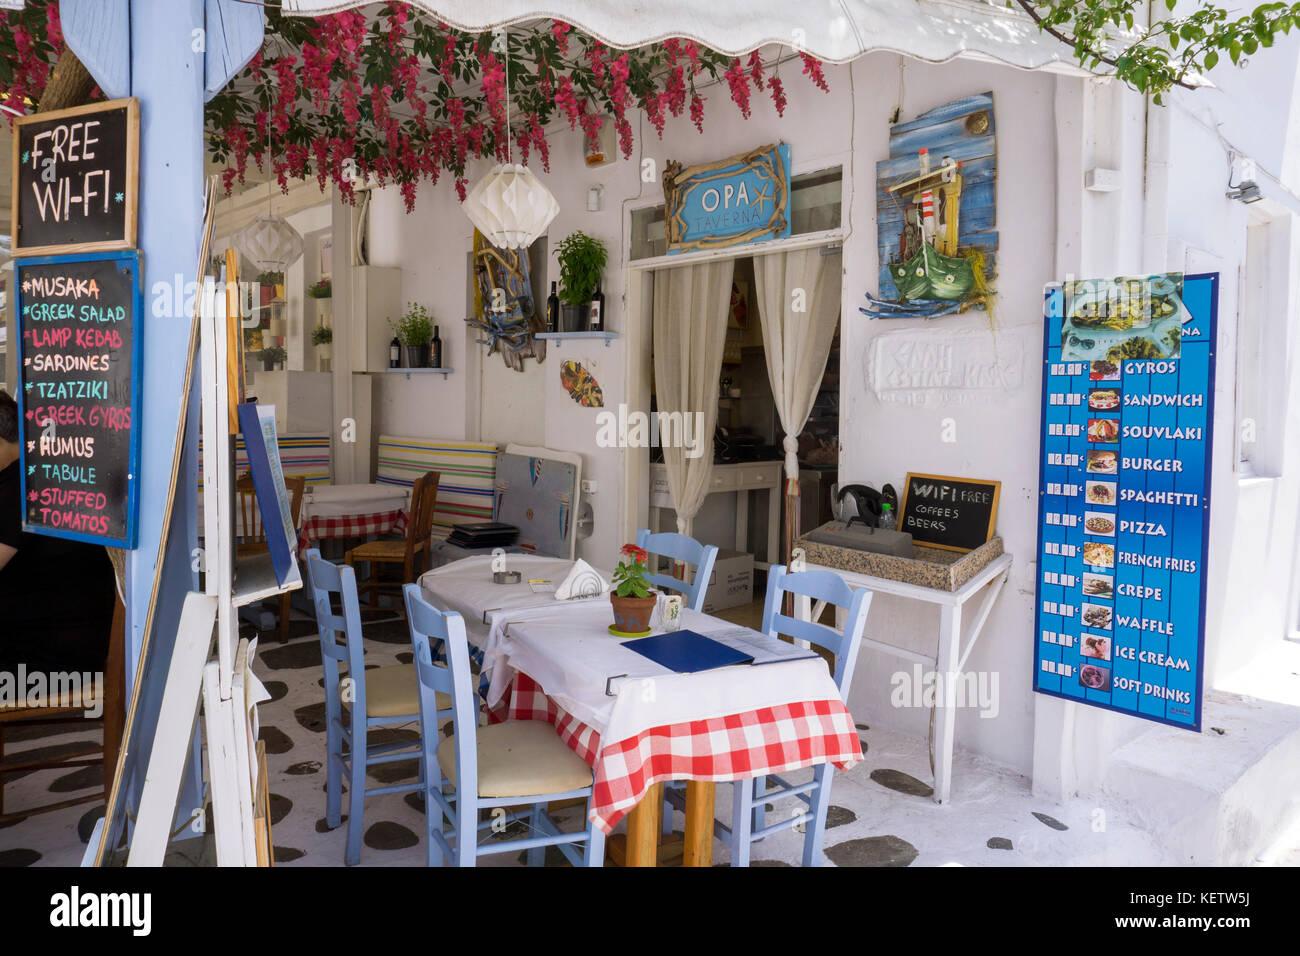 Typical greek restaurant at Mykonos-town, Mykonos,Greece - Stock Image